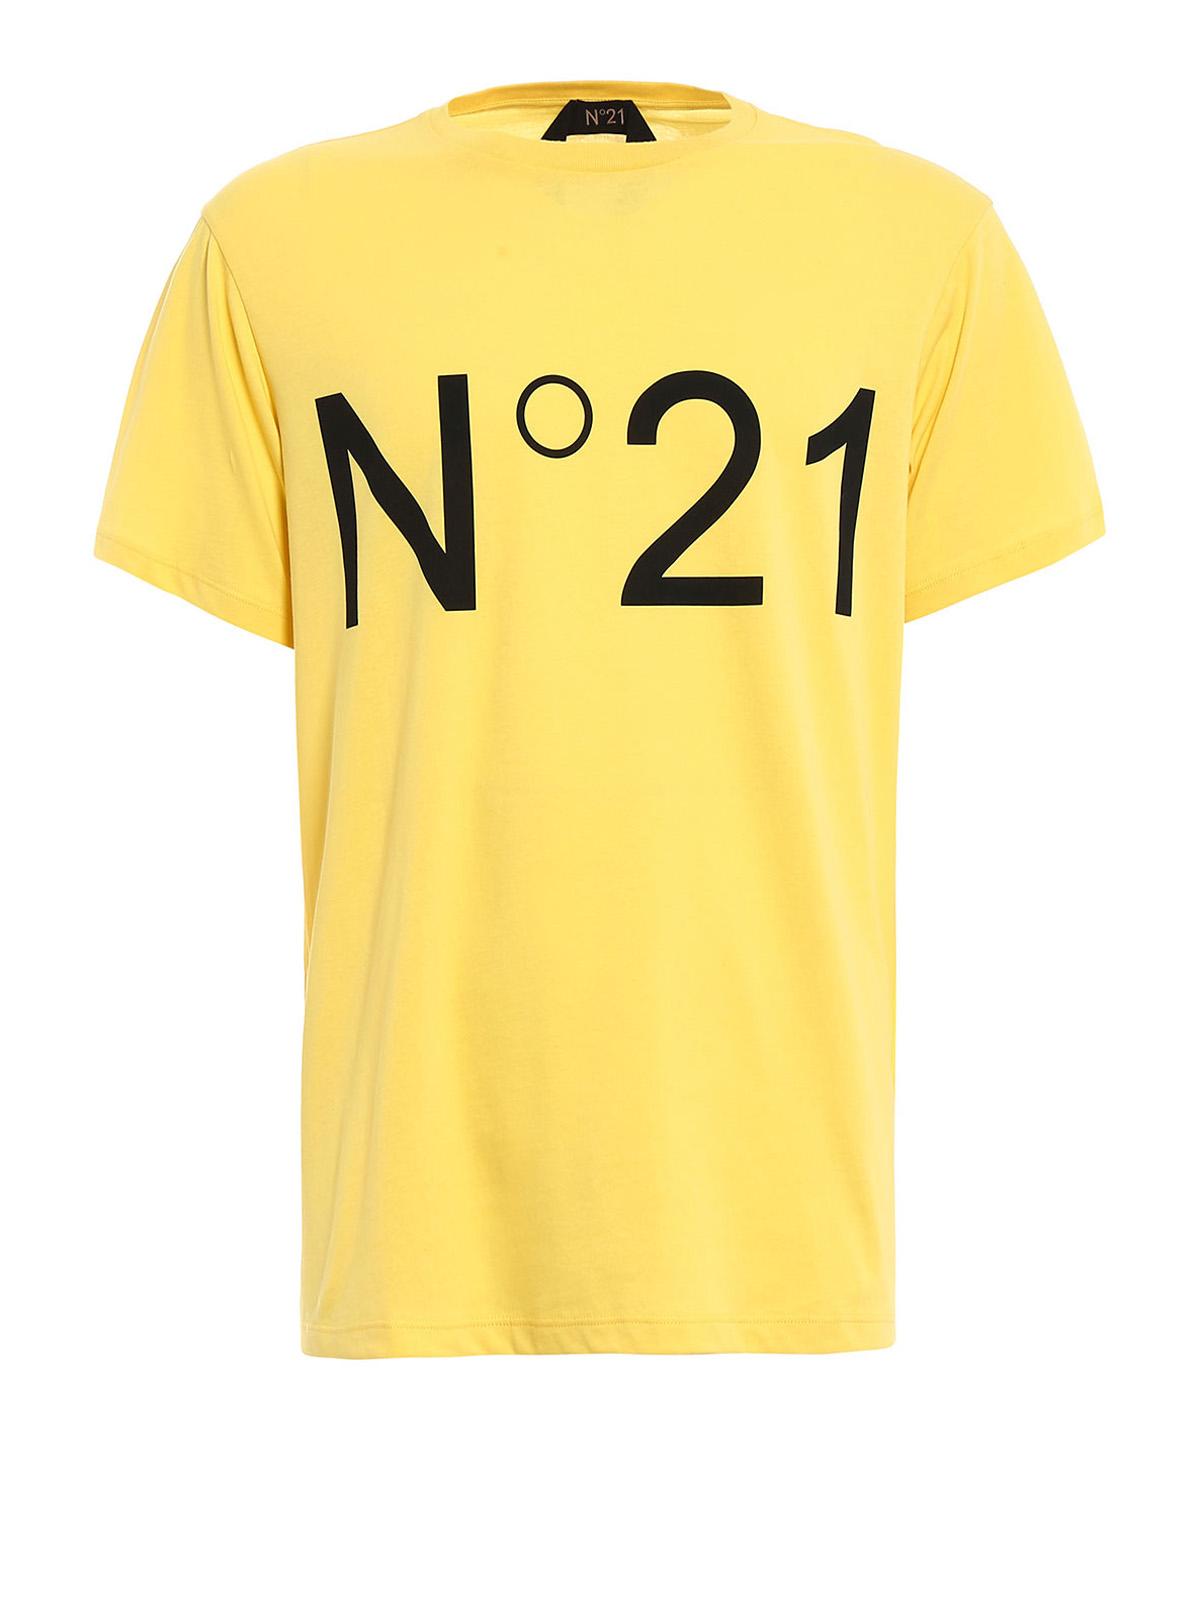 Logo print yellow cotton tee by n 21 t shirts ikrix for Print logo on shirt